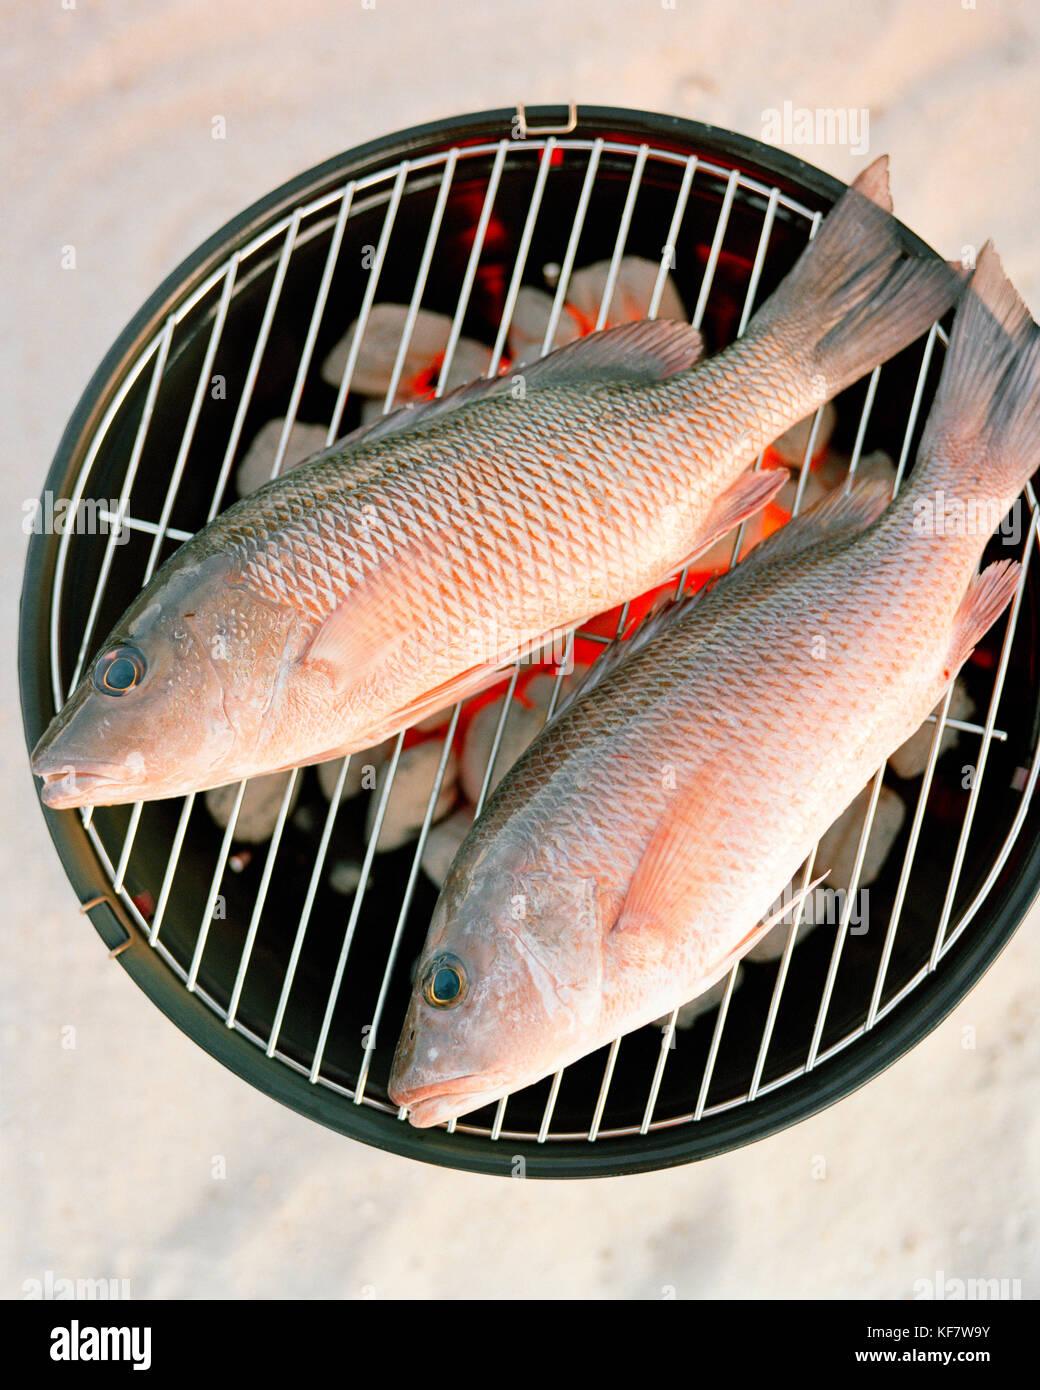 USA, Florida, Red Snapper fish on grill, close-up, Islamorada - Stock Photo